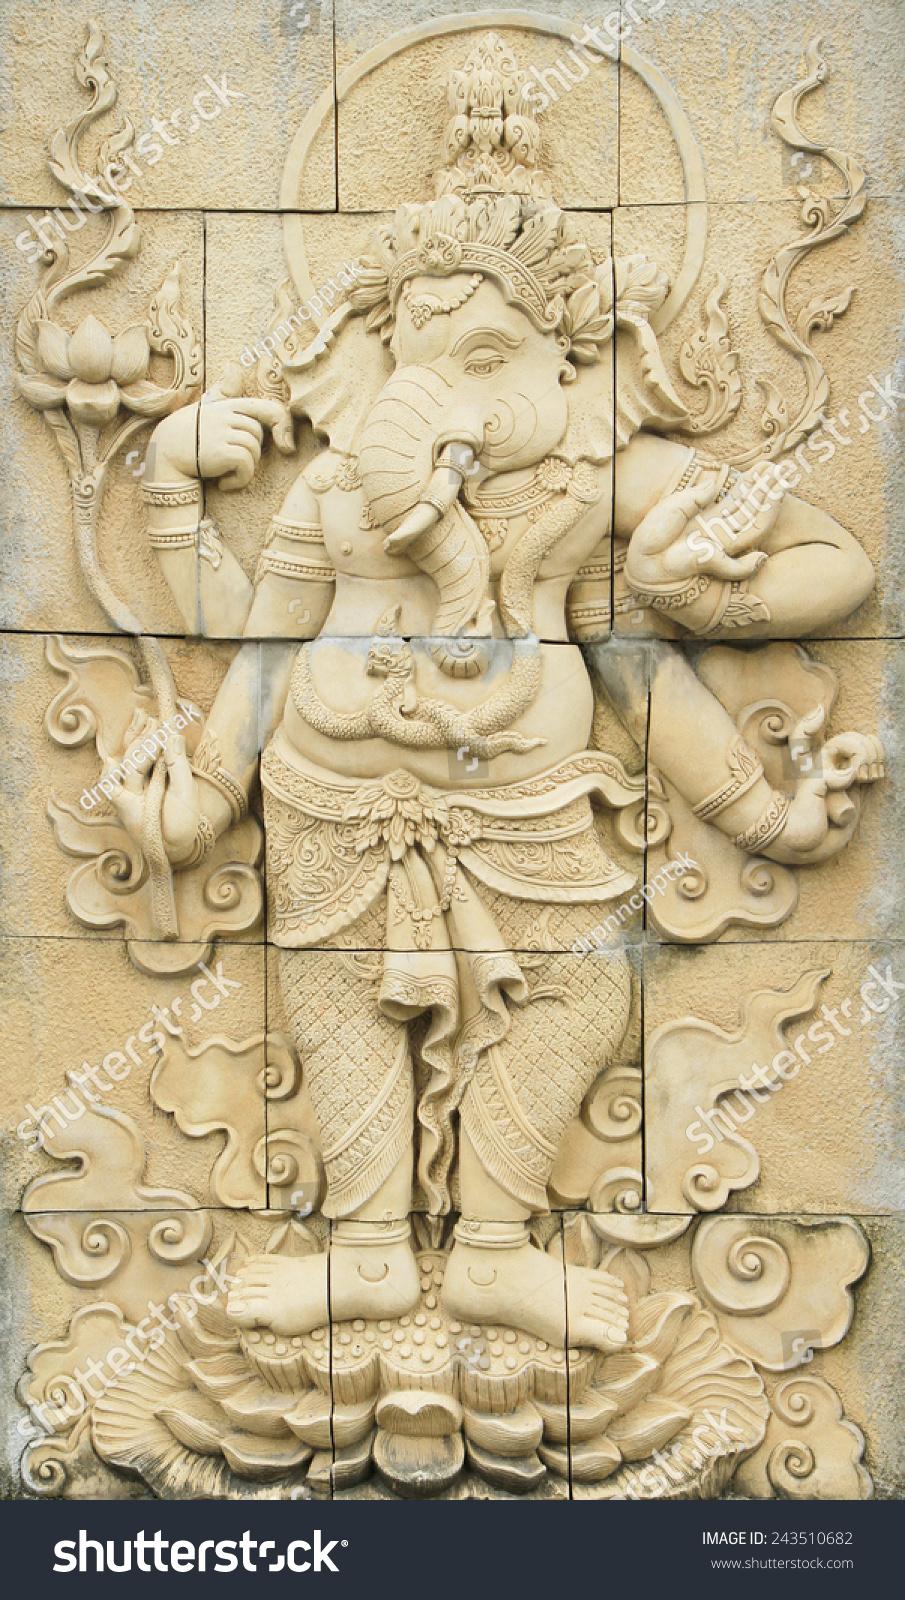 Bangkok thailand jul 26 ganesha sculpture stock photo edit now